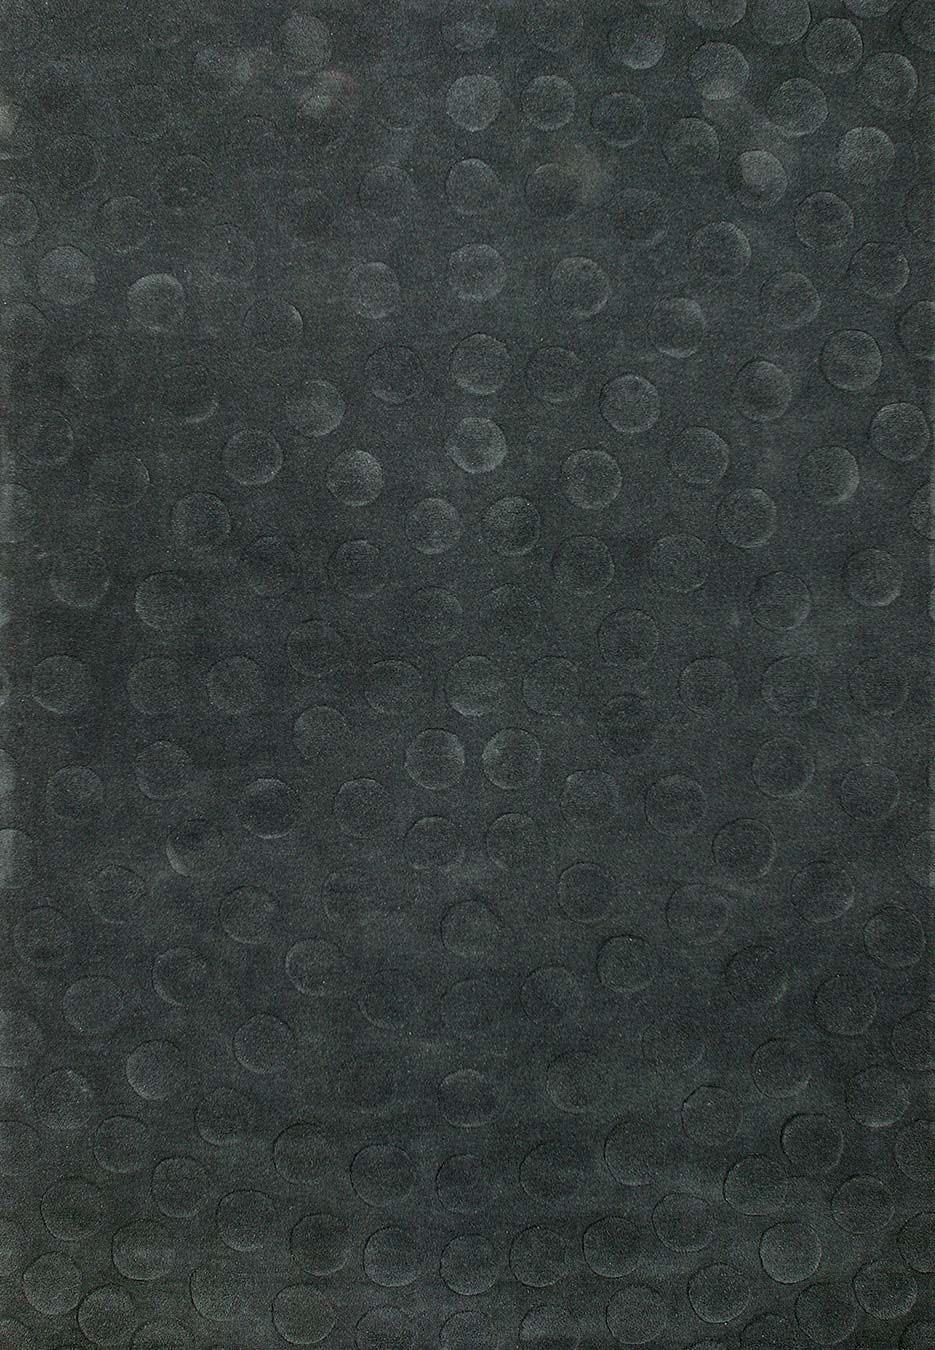 Radiate rug in Charcoal colourway overhead image